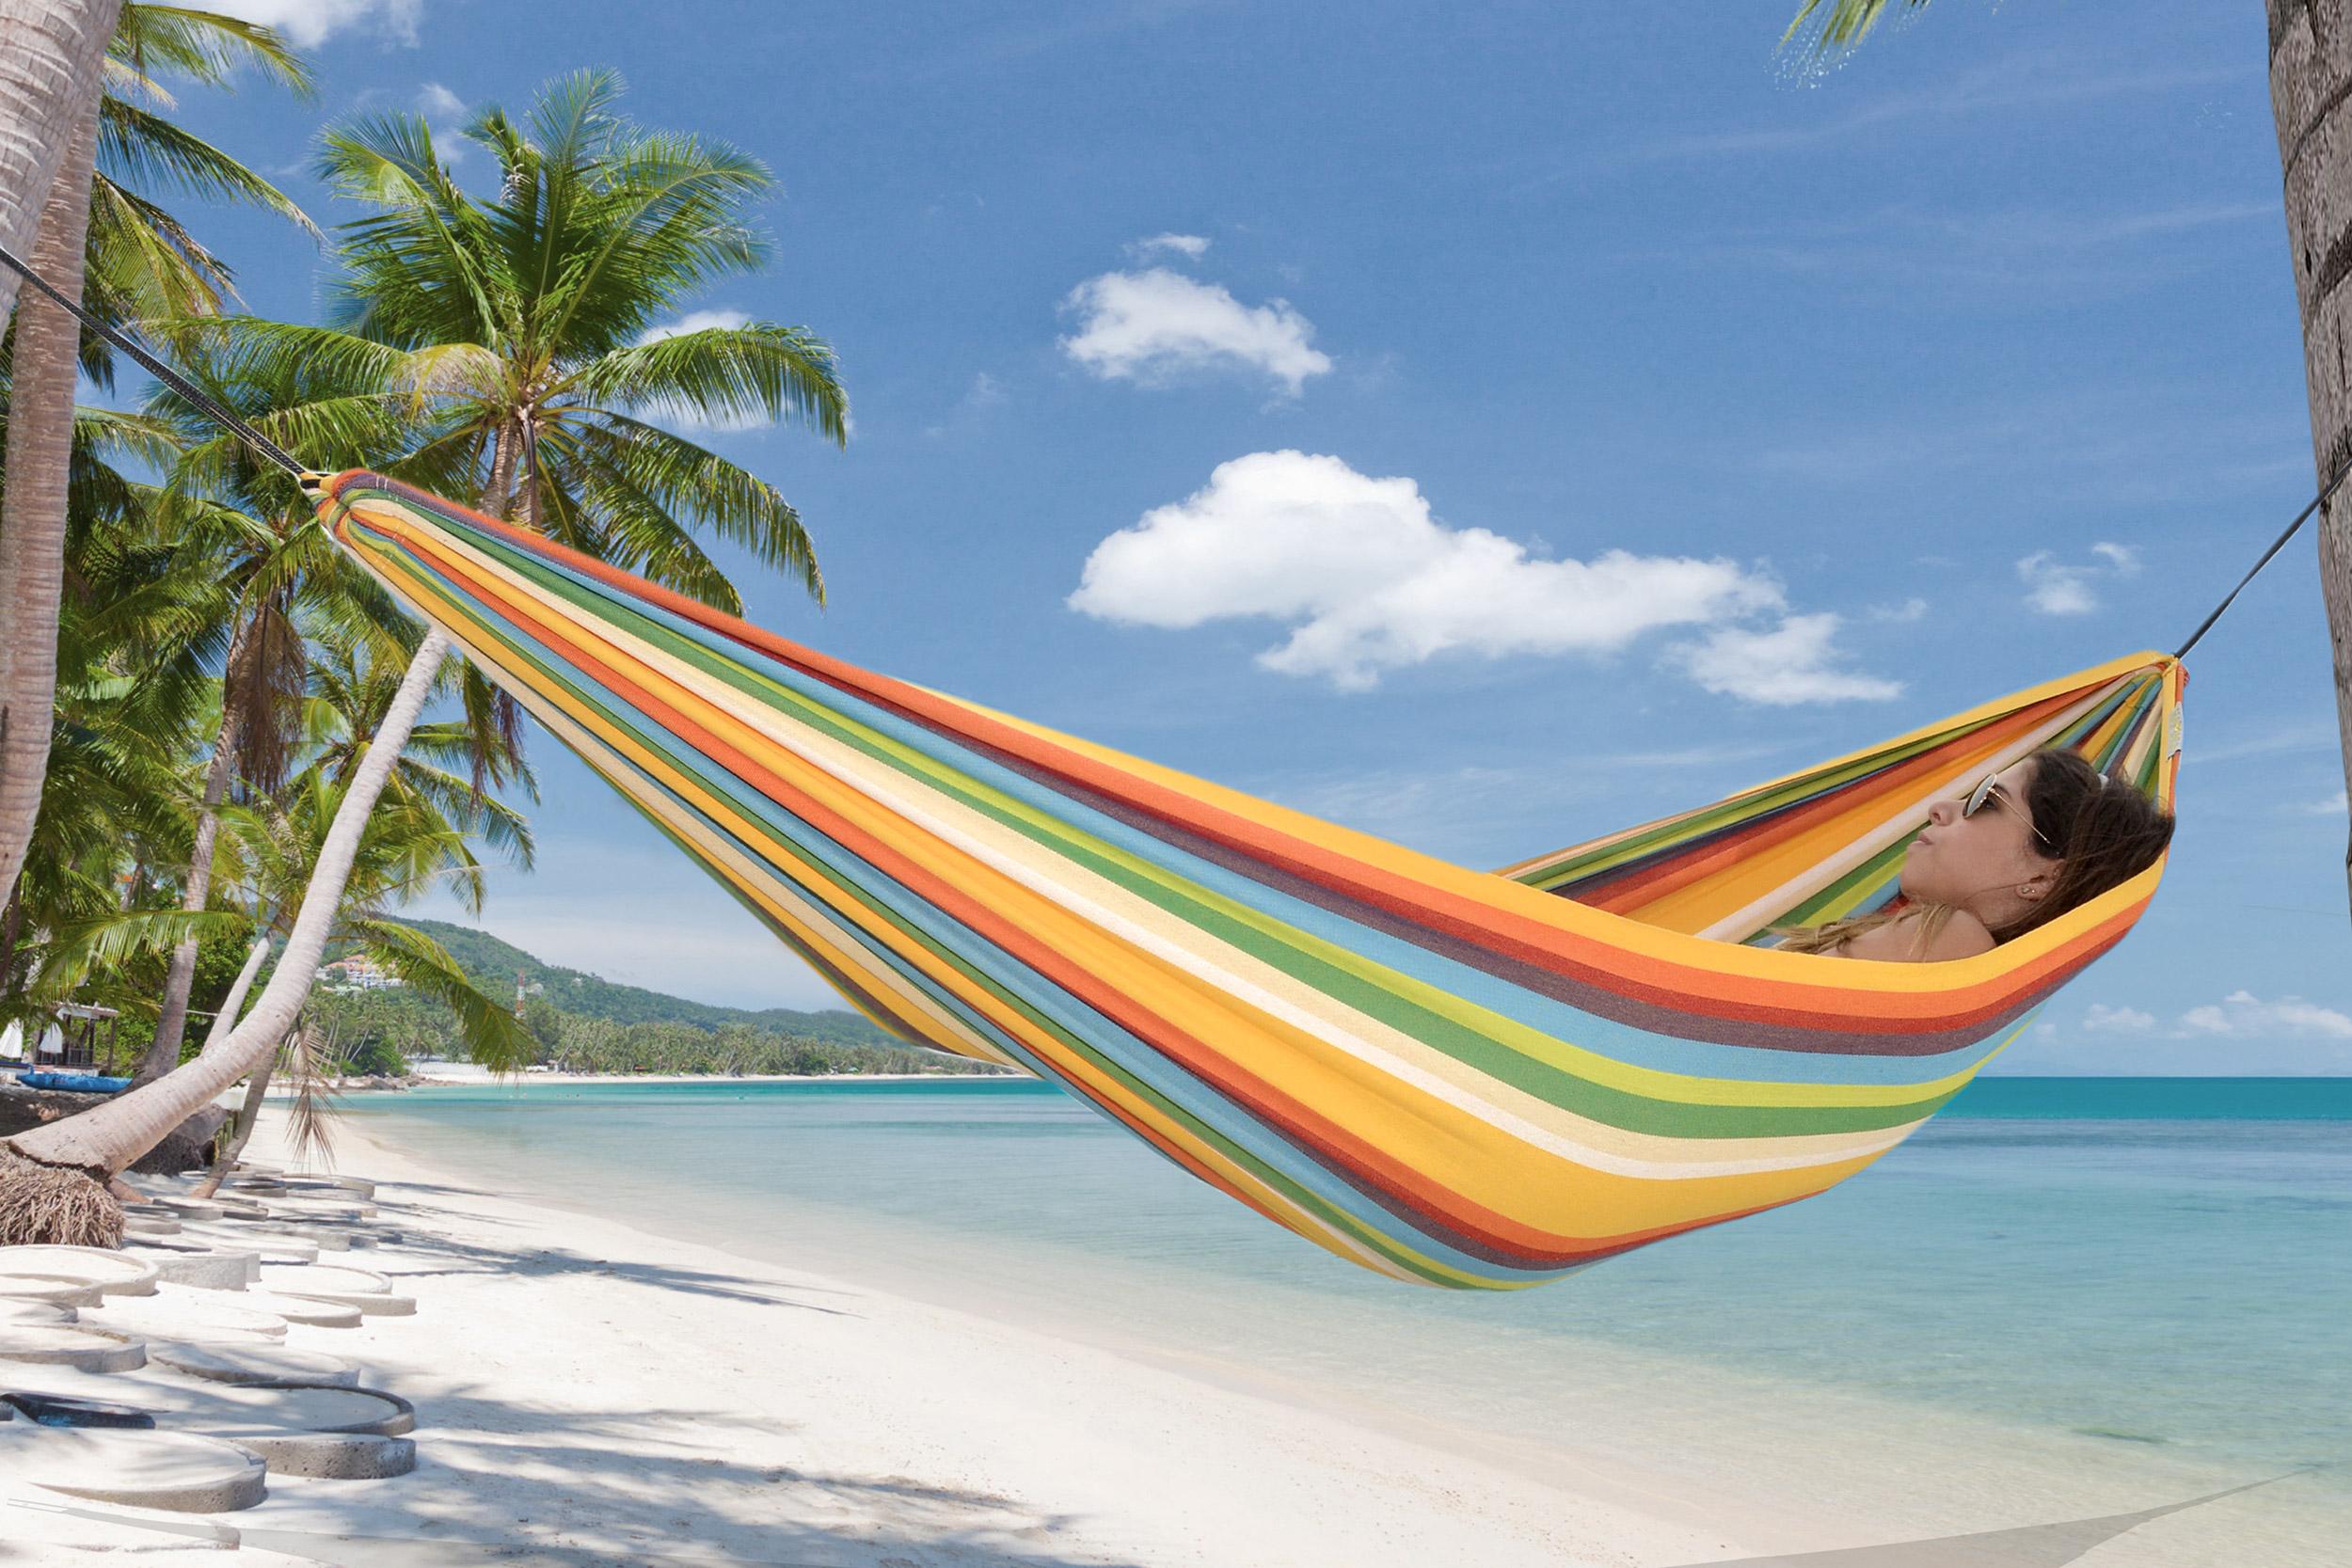 Hamaca playa 28 images hamaca de playa lidl se for Hamaca plegable playa